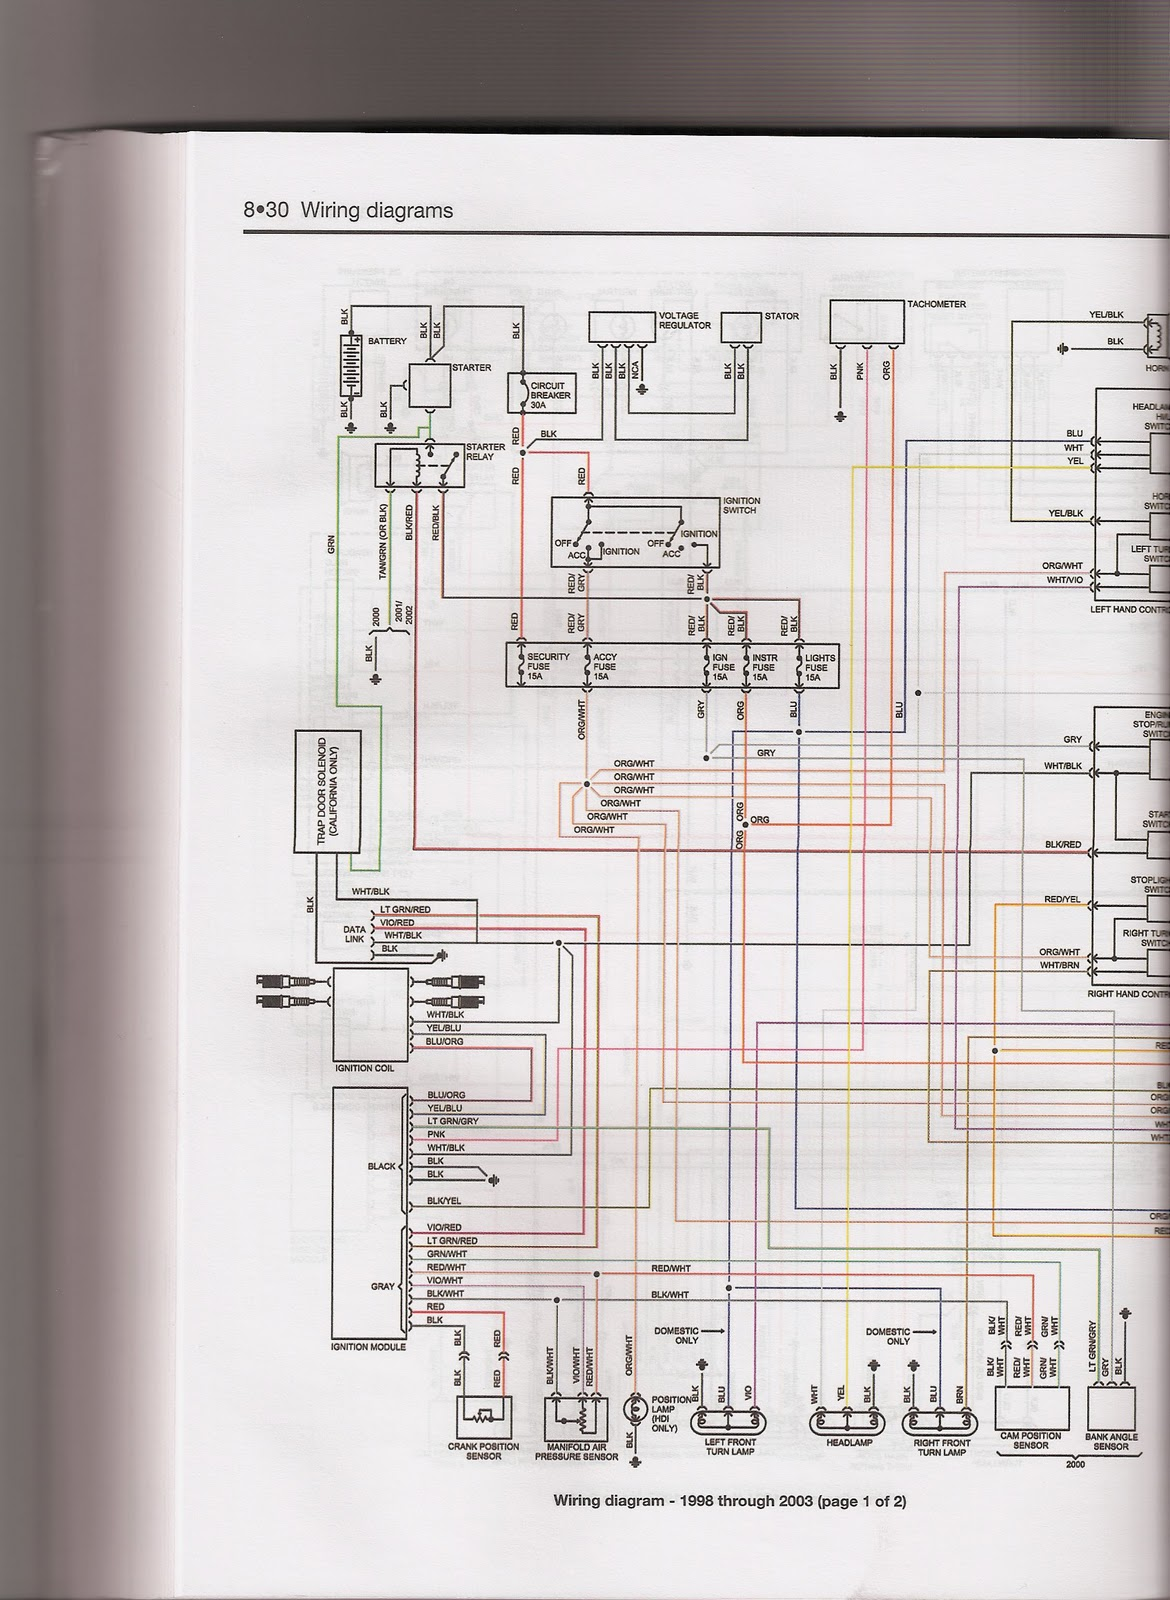 medium resolution of 98 sportster wiring diagram reveolution of wiring diagram u2022 1986 harley sportster 883 wiring diagram